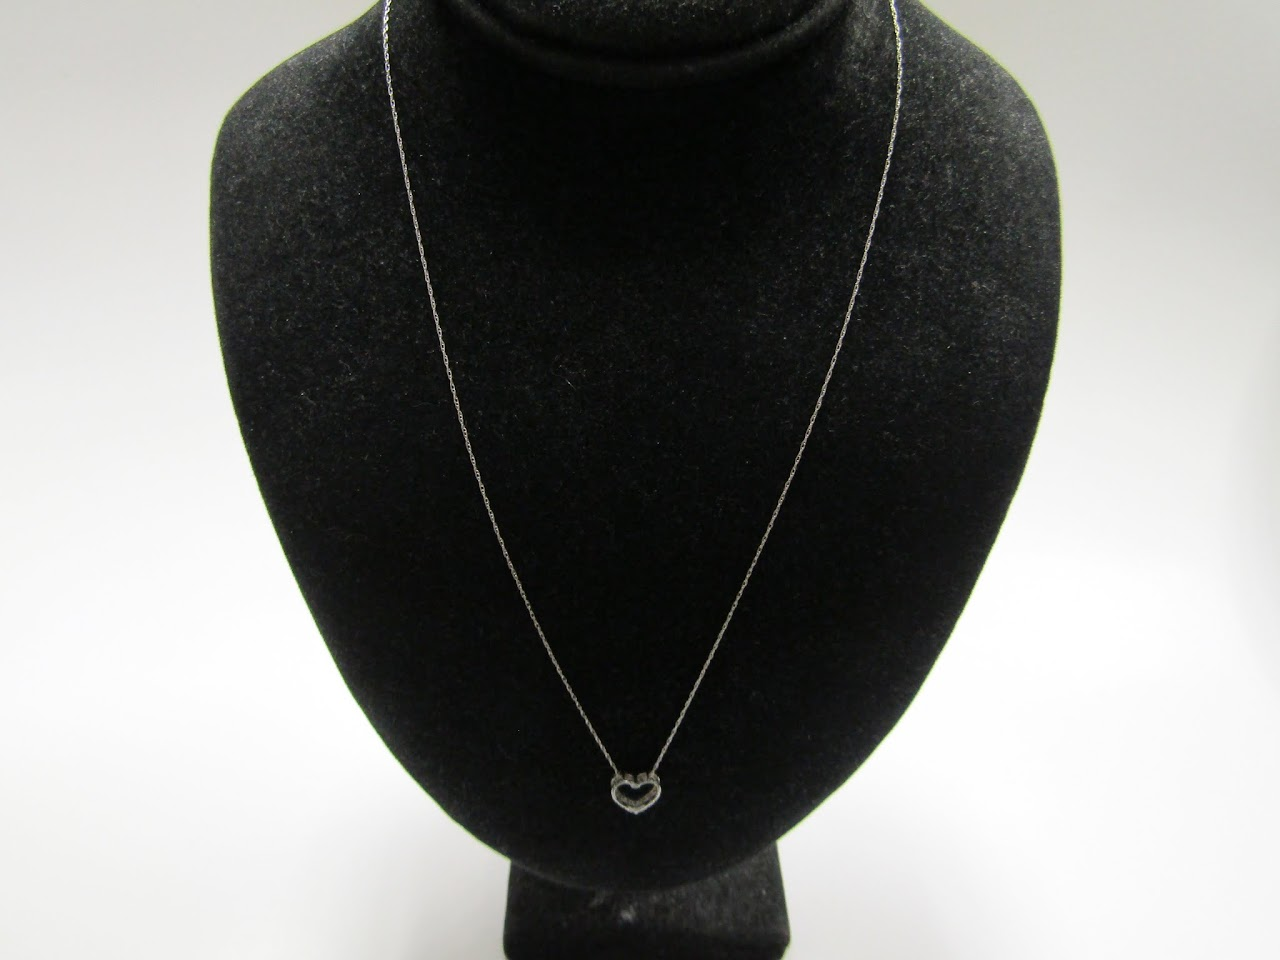 10 K White Gold necklace & Pendant